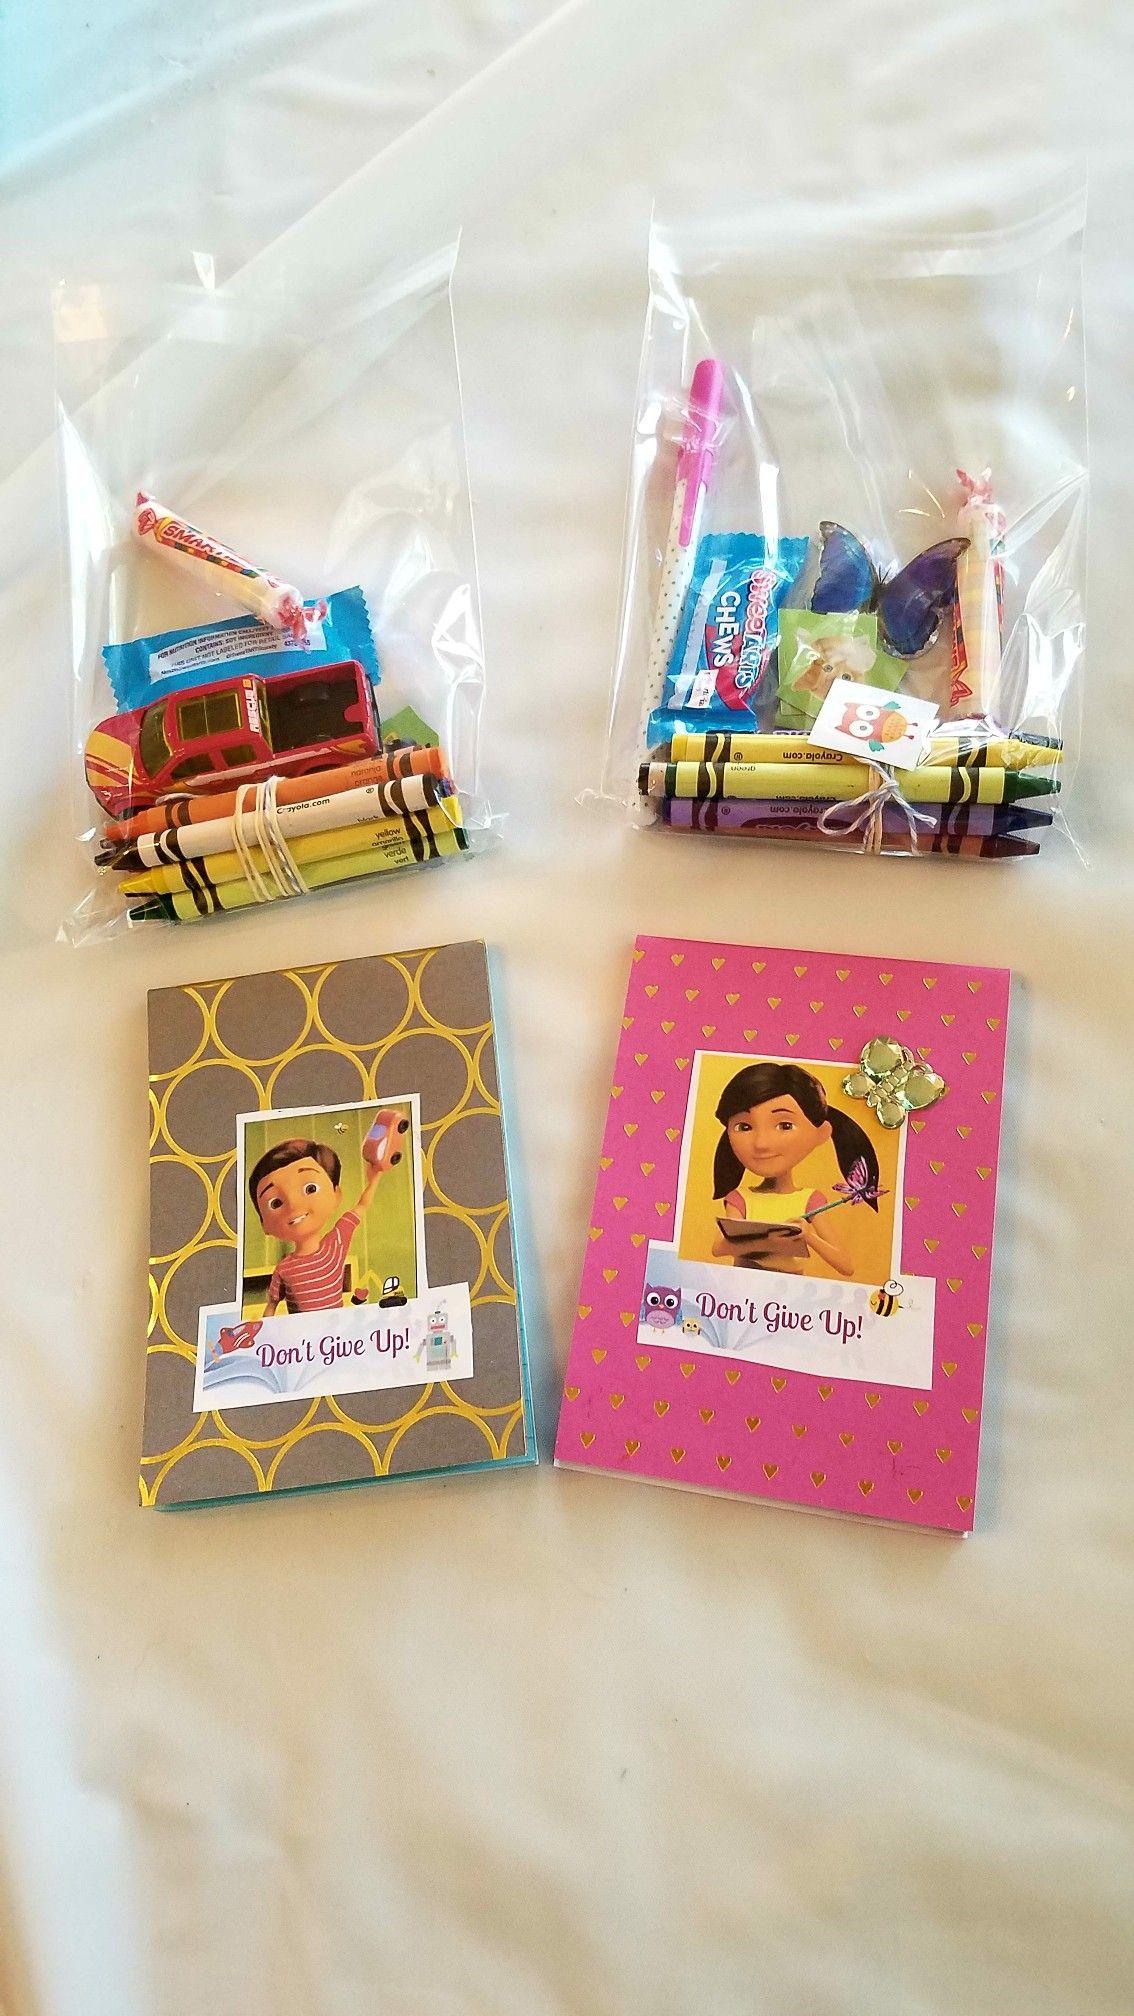 Caleb Sophia Jw International Convention Gifts For Kids